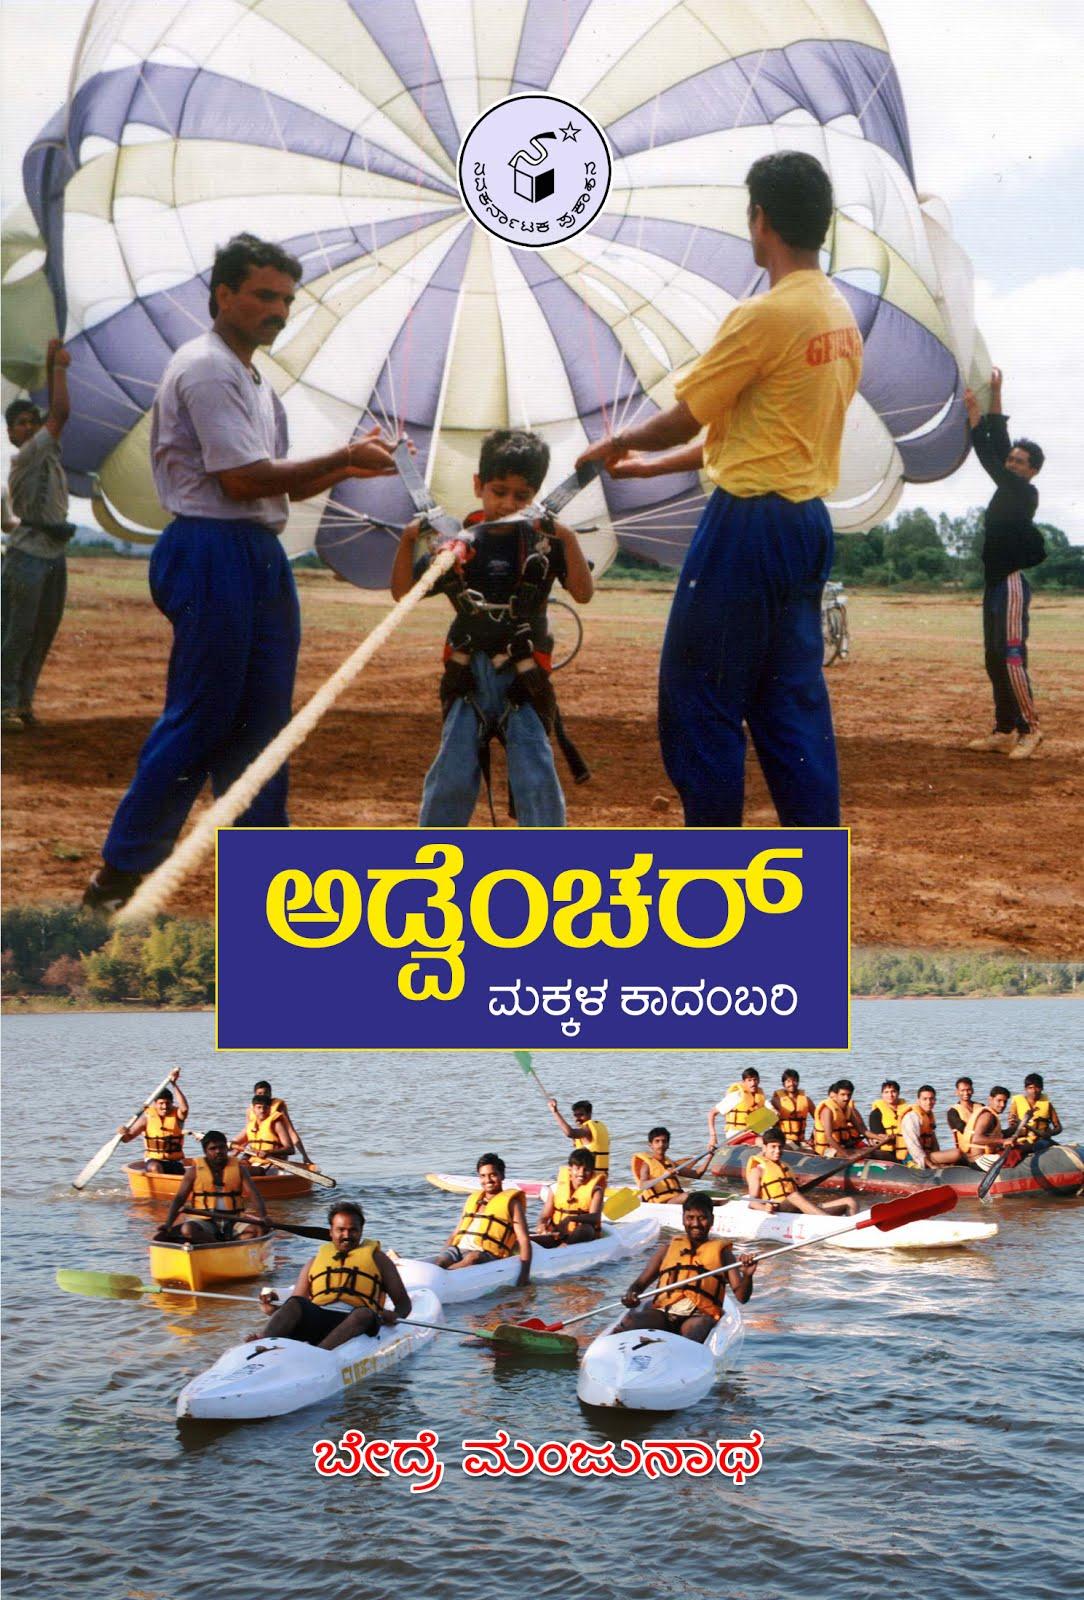 Adventure - A Children's Novel on Outward Bound Education in Kannada by Bedre Manjunath